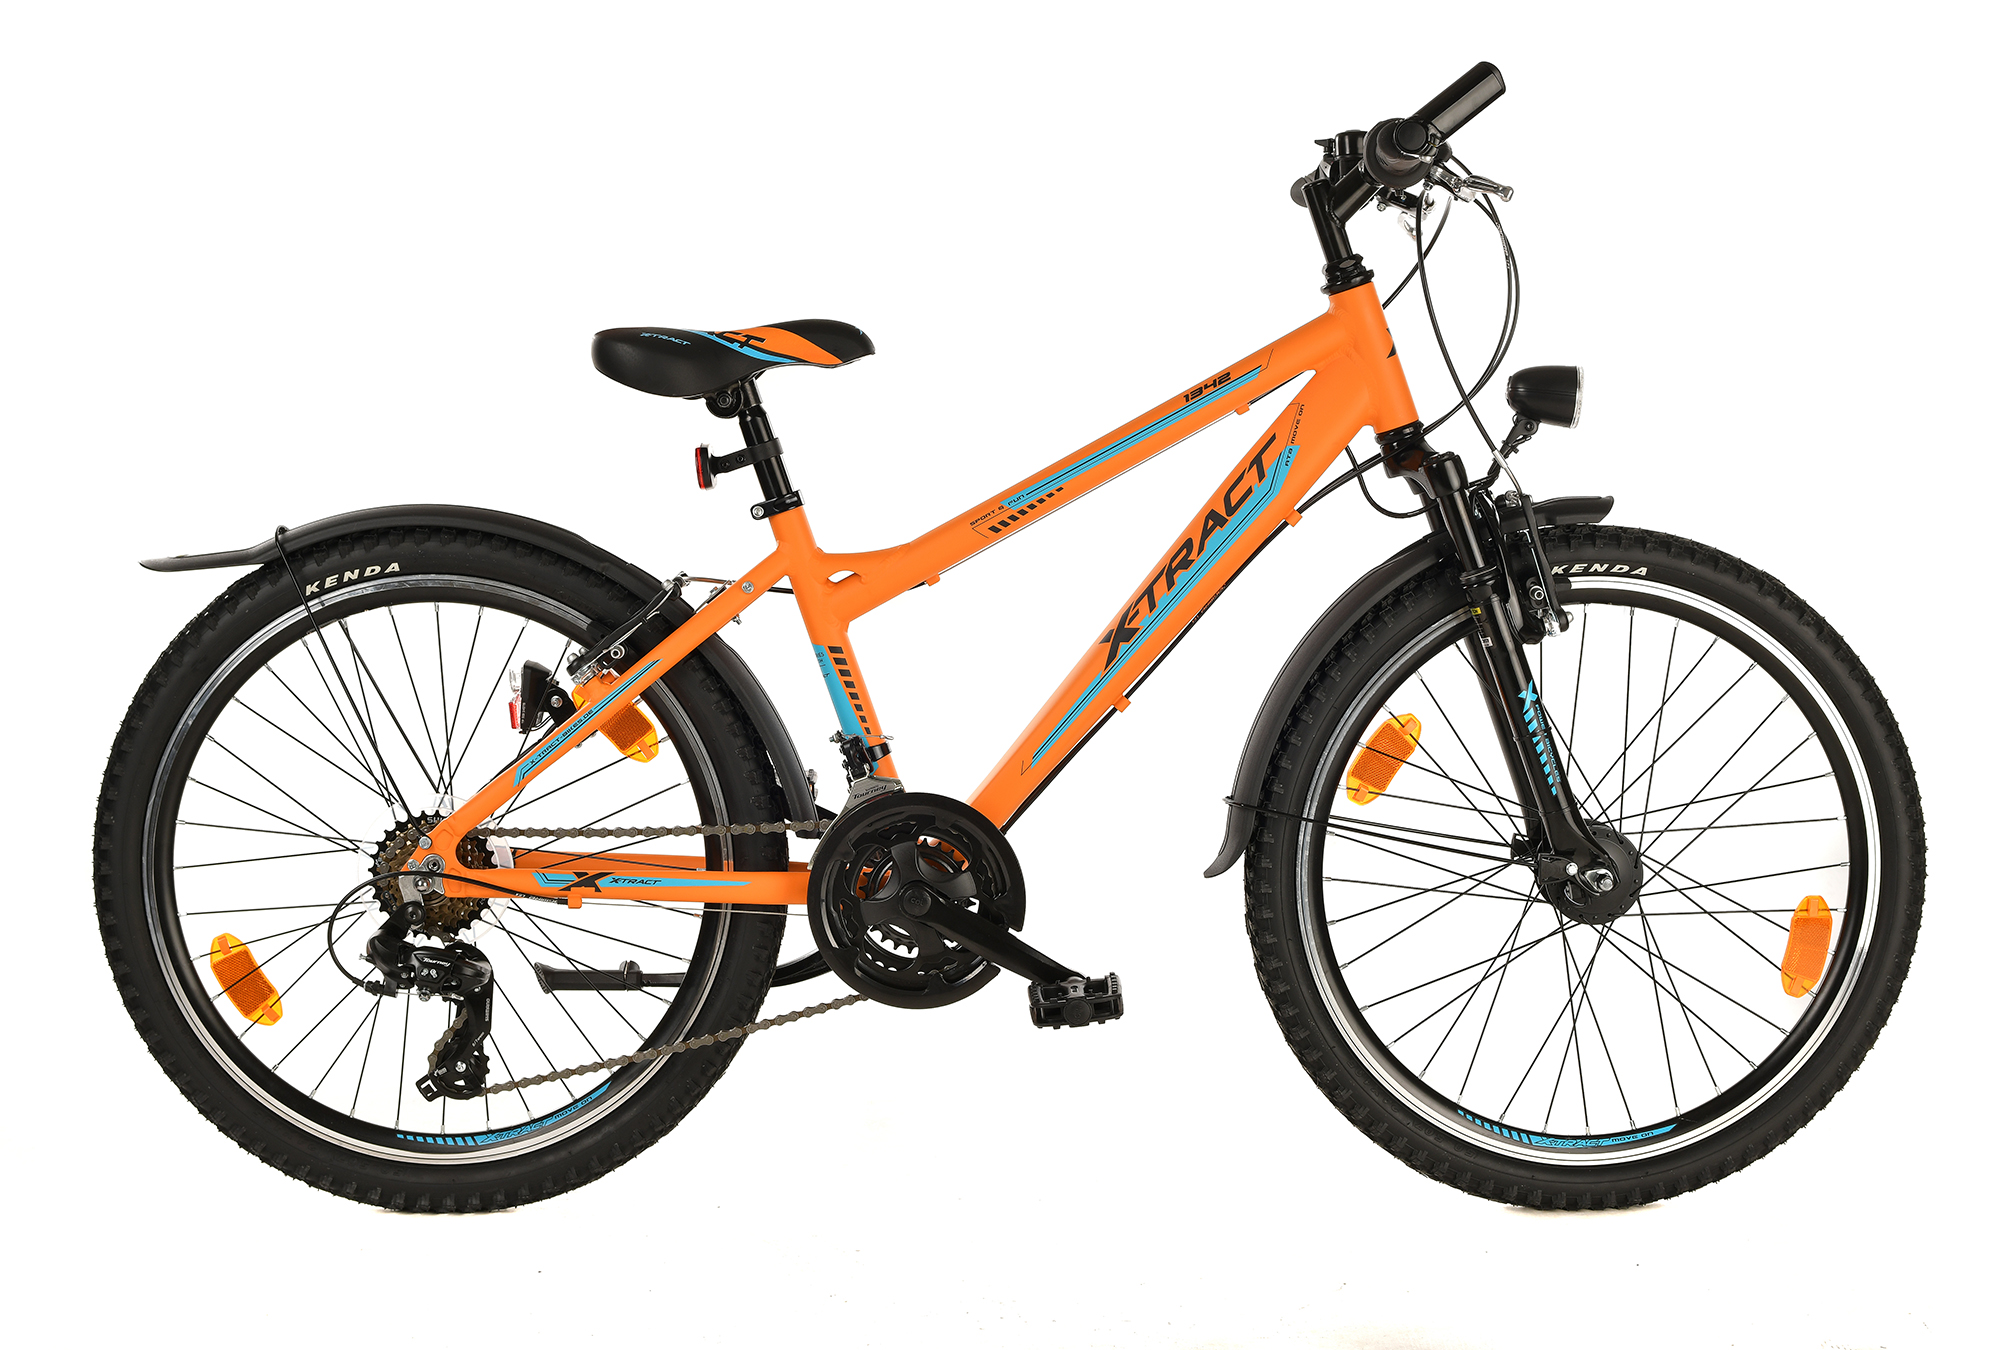 X Tract 1342 Orange Feldmeier Bikes